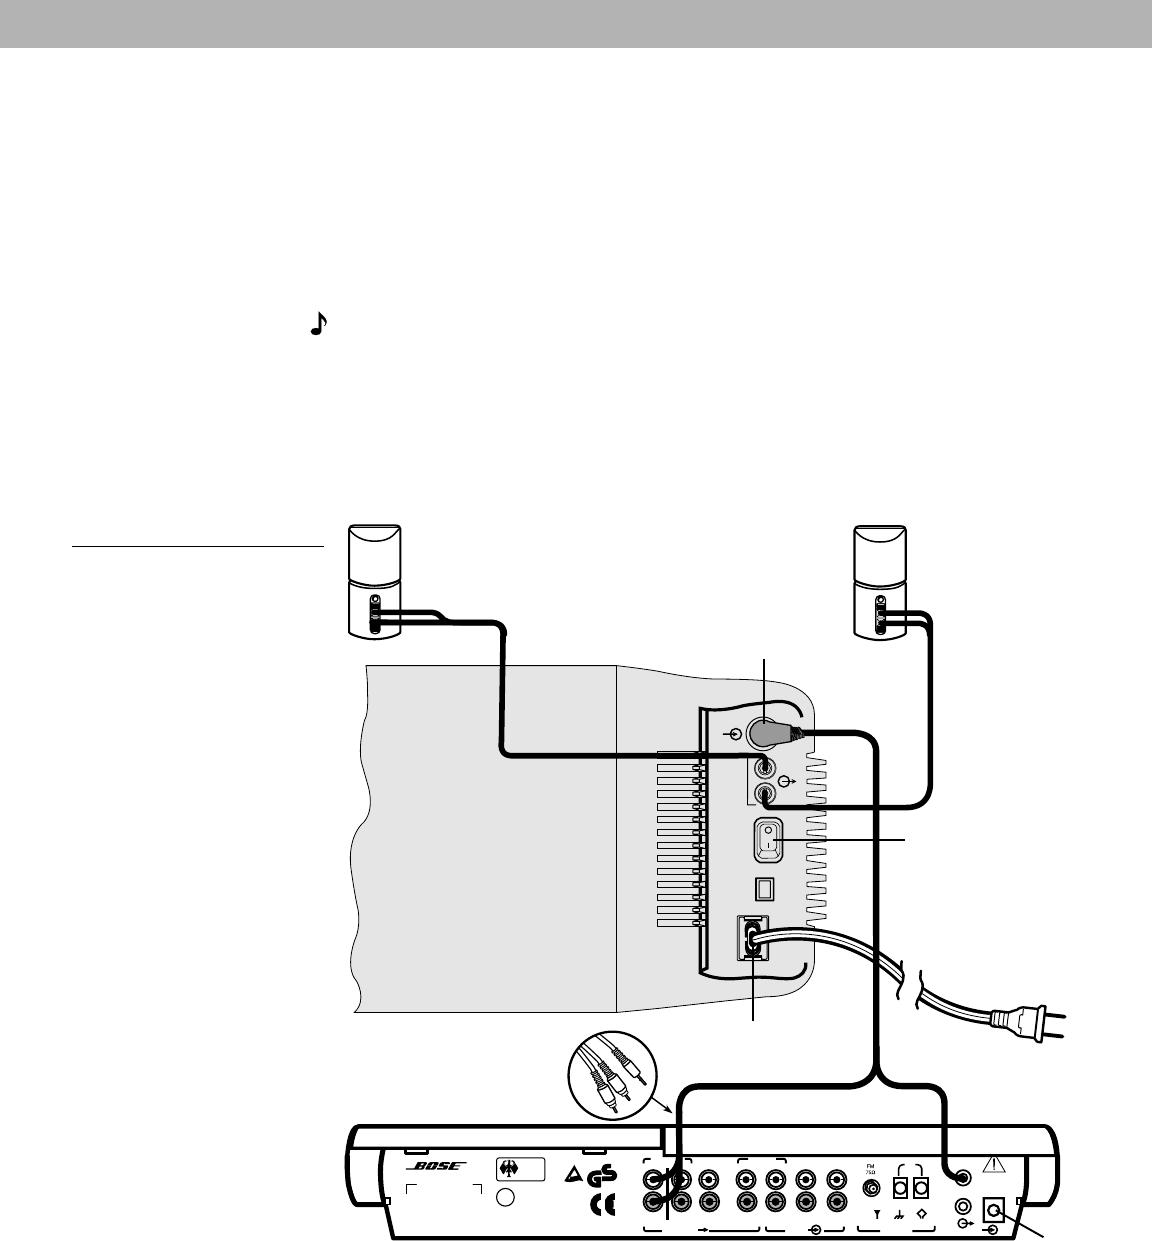 [SCHEMATICS_49CH]  Handleiding Bose lifestyle 5 series II (pagina 11 van 28) (English)   Bose Lifestyle 28 Wiring Diagram      Gebruikershandleiding.com